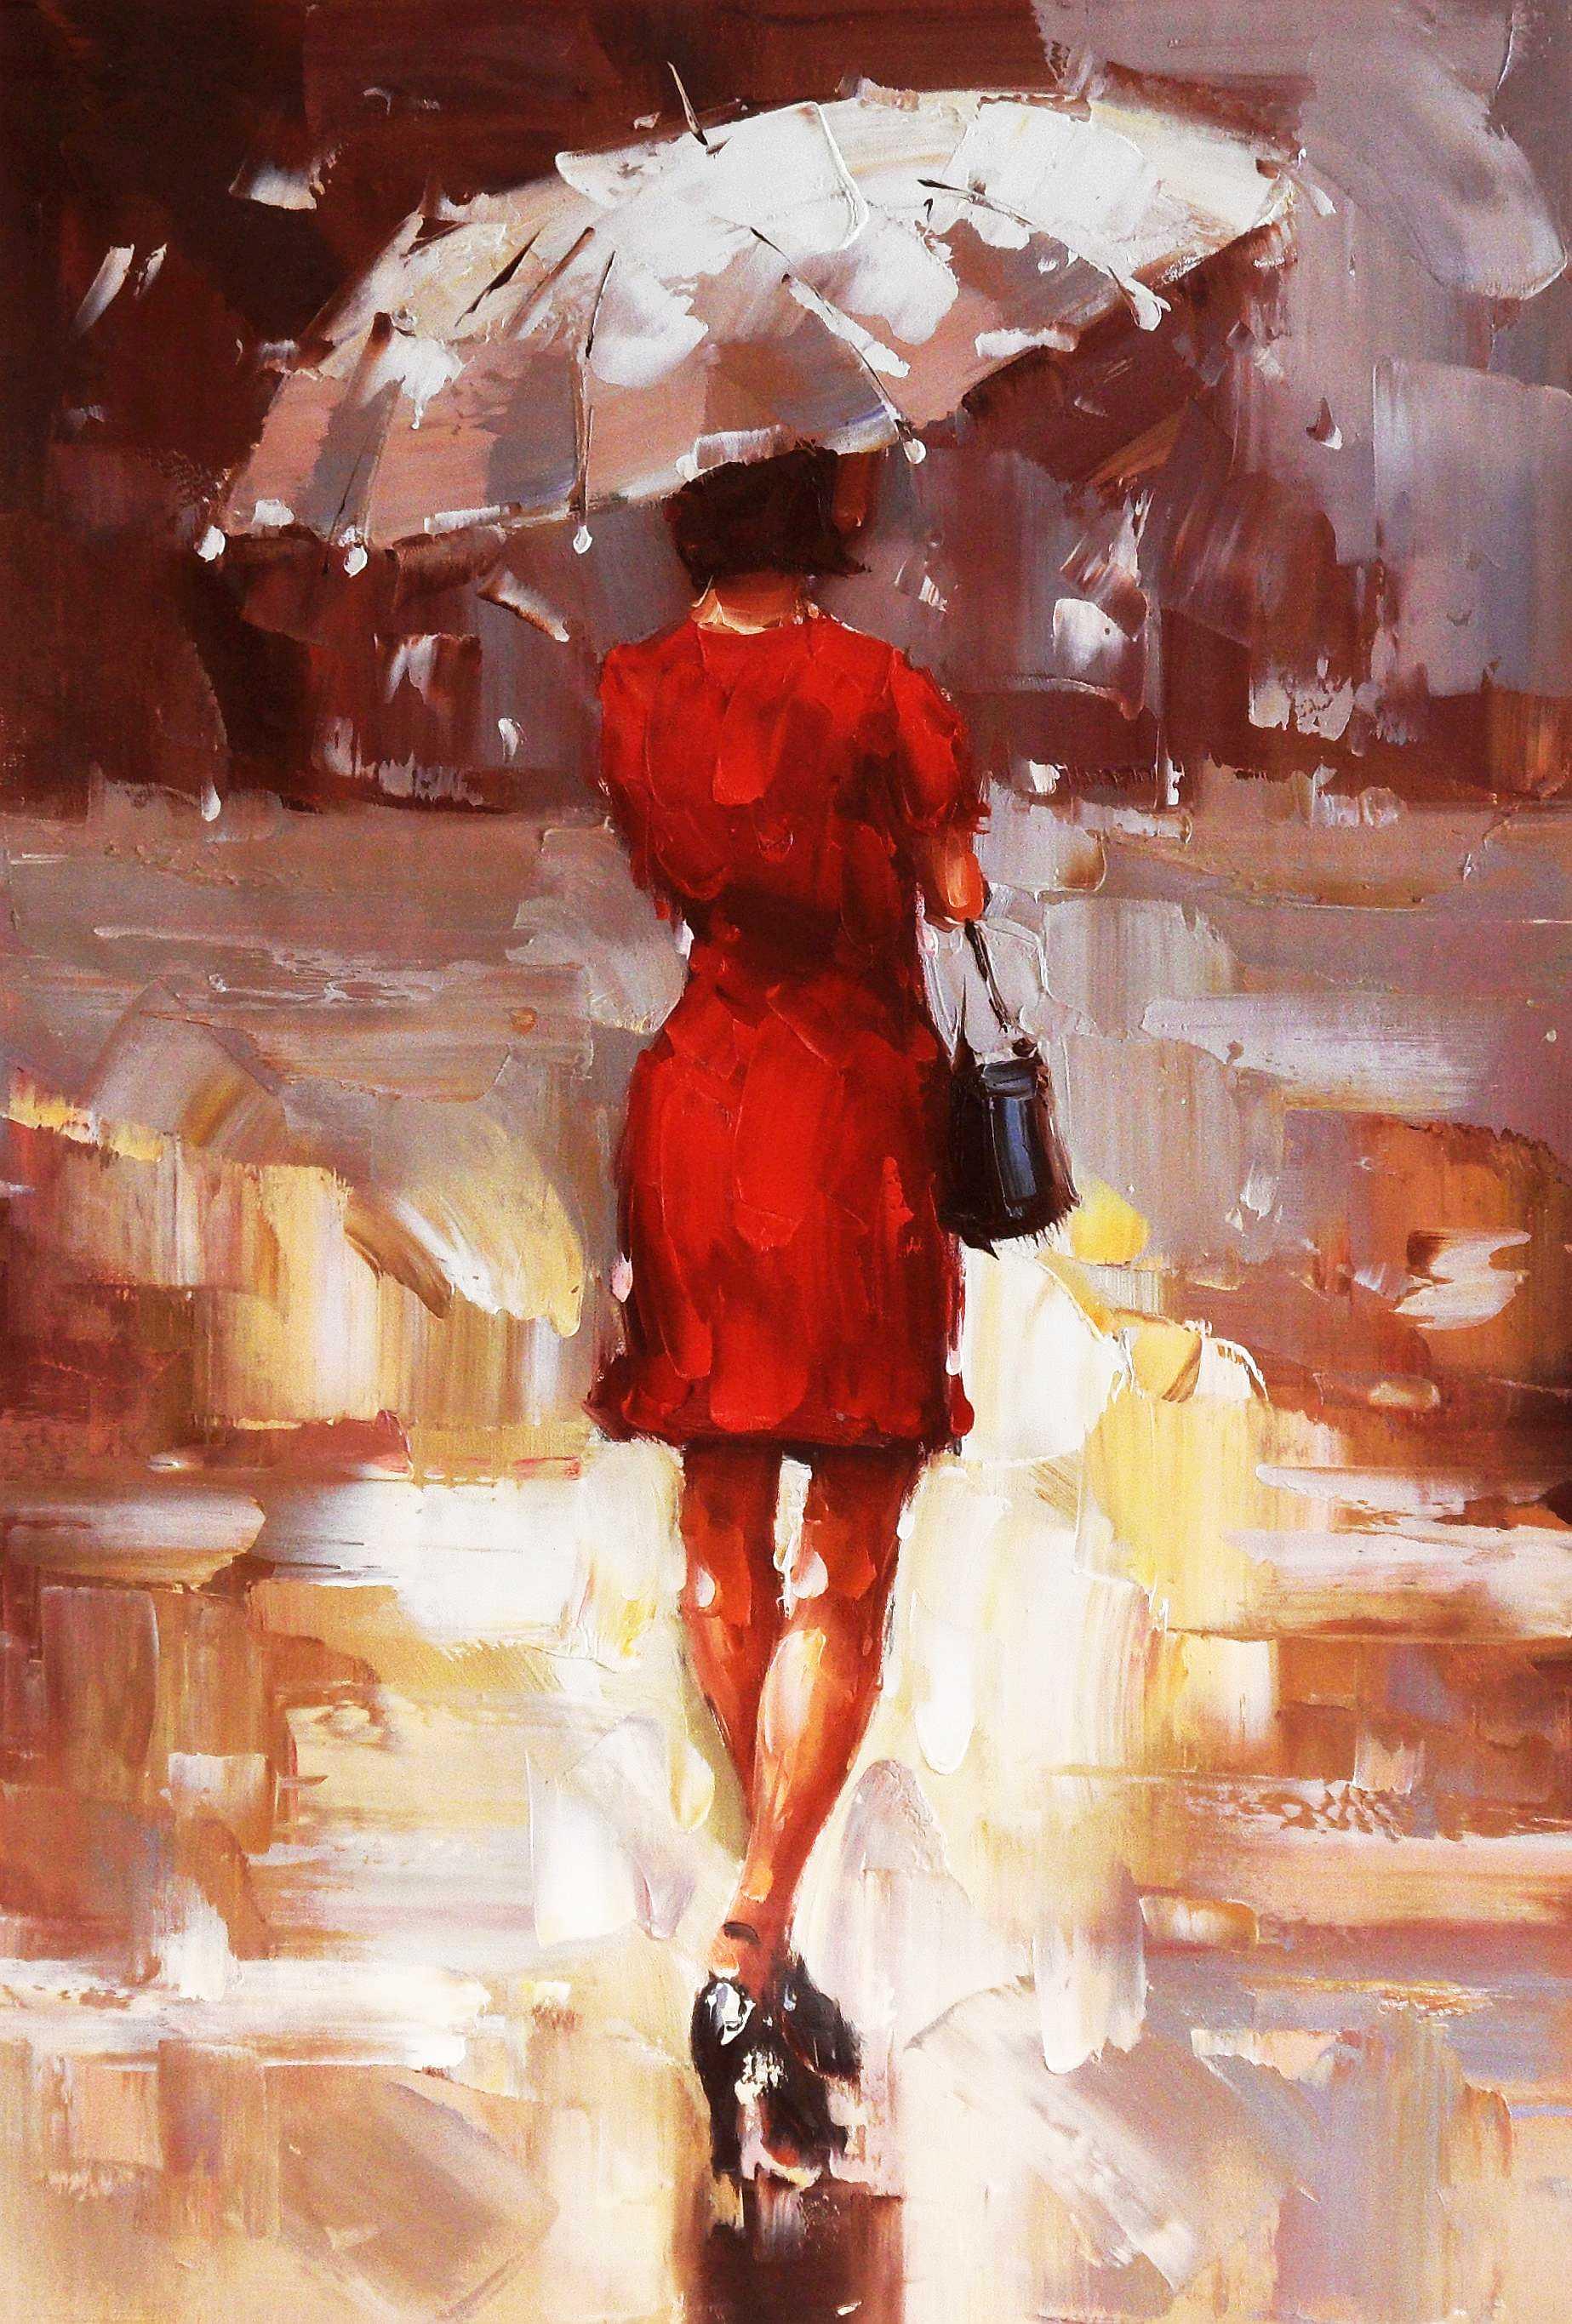 Modern Art - Walking Lady II d95386 60x90cm exquisites Ölbild